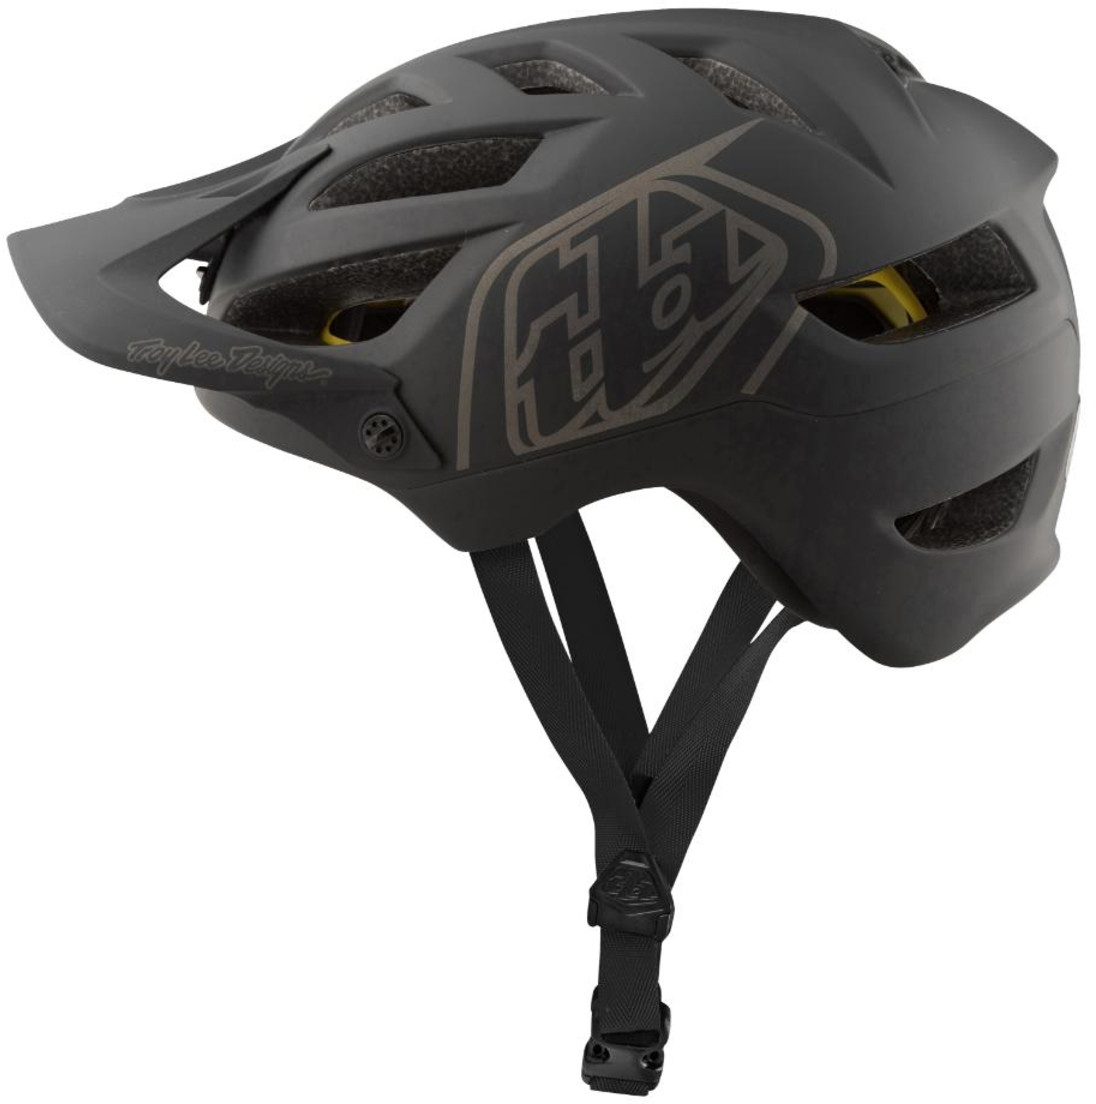 2019 TLD Troy Lee Designs A1 Classic Mips Mountain Bike Helmet Black//Stone